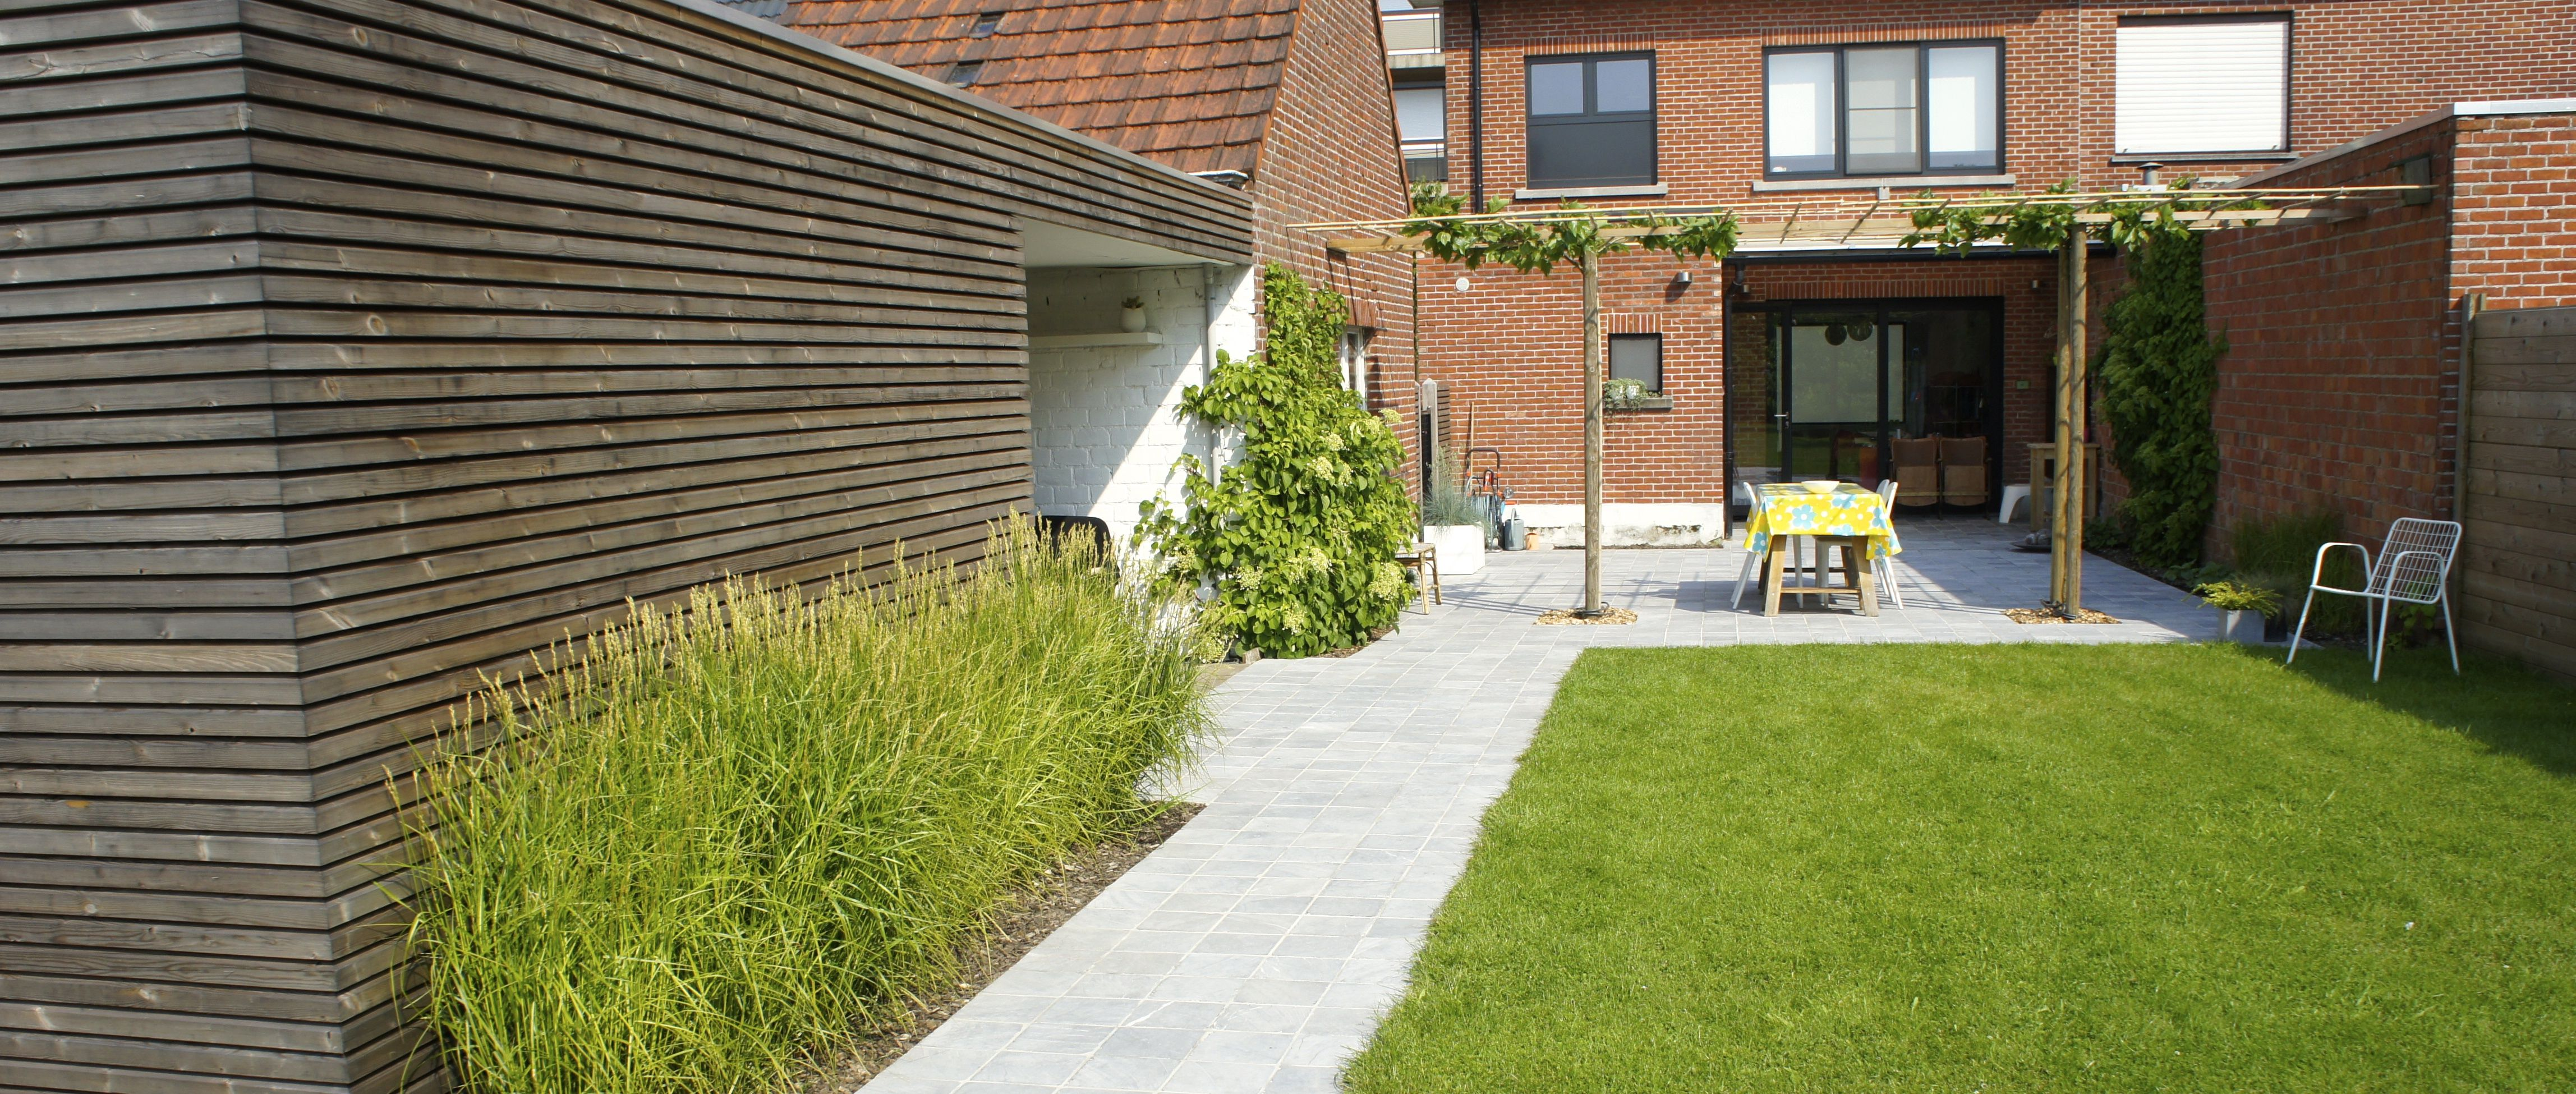 Tuinhuis met keuken